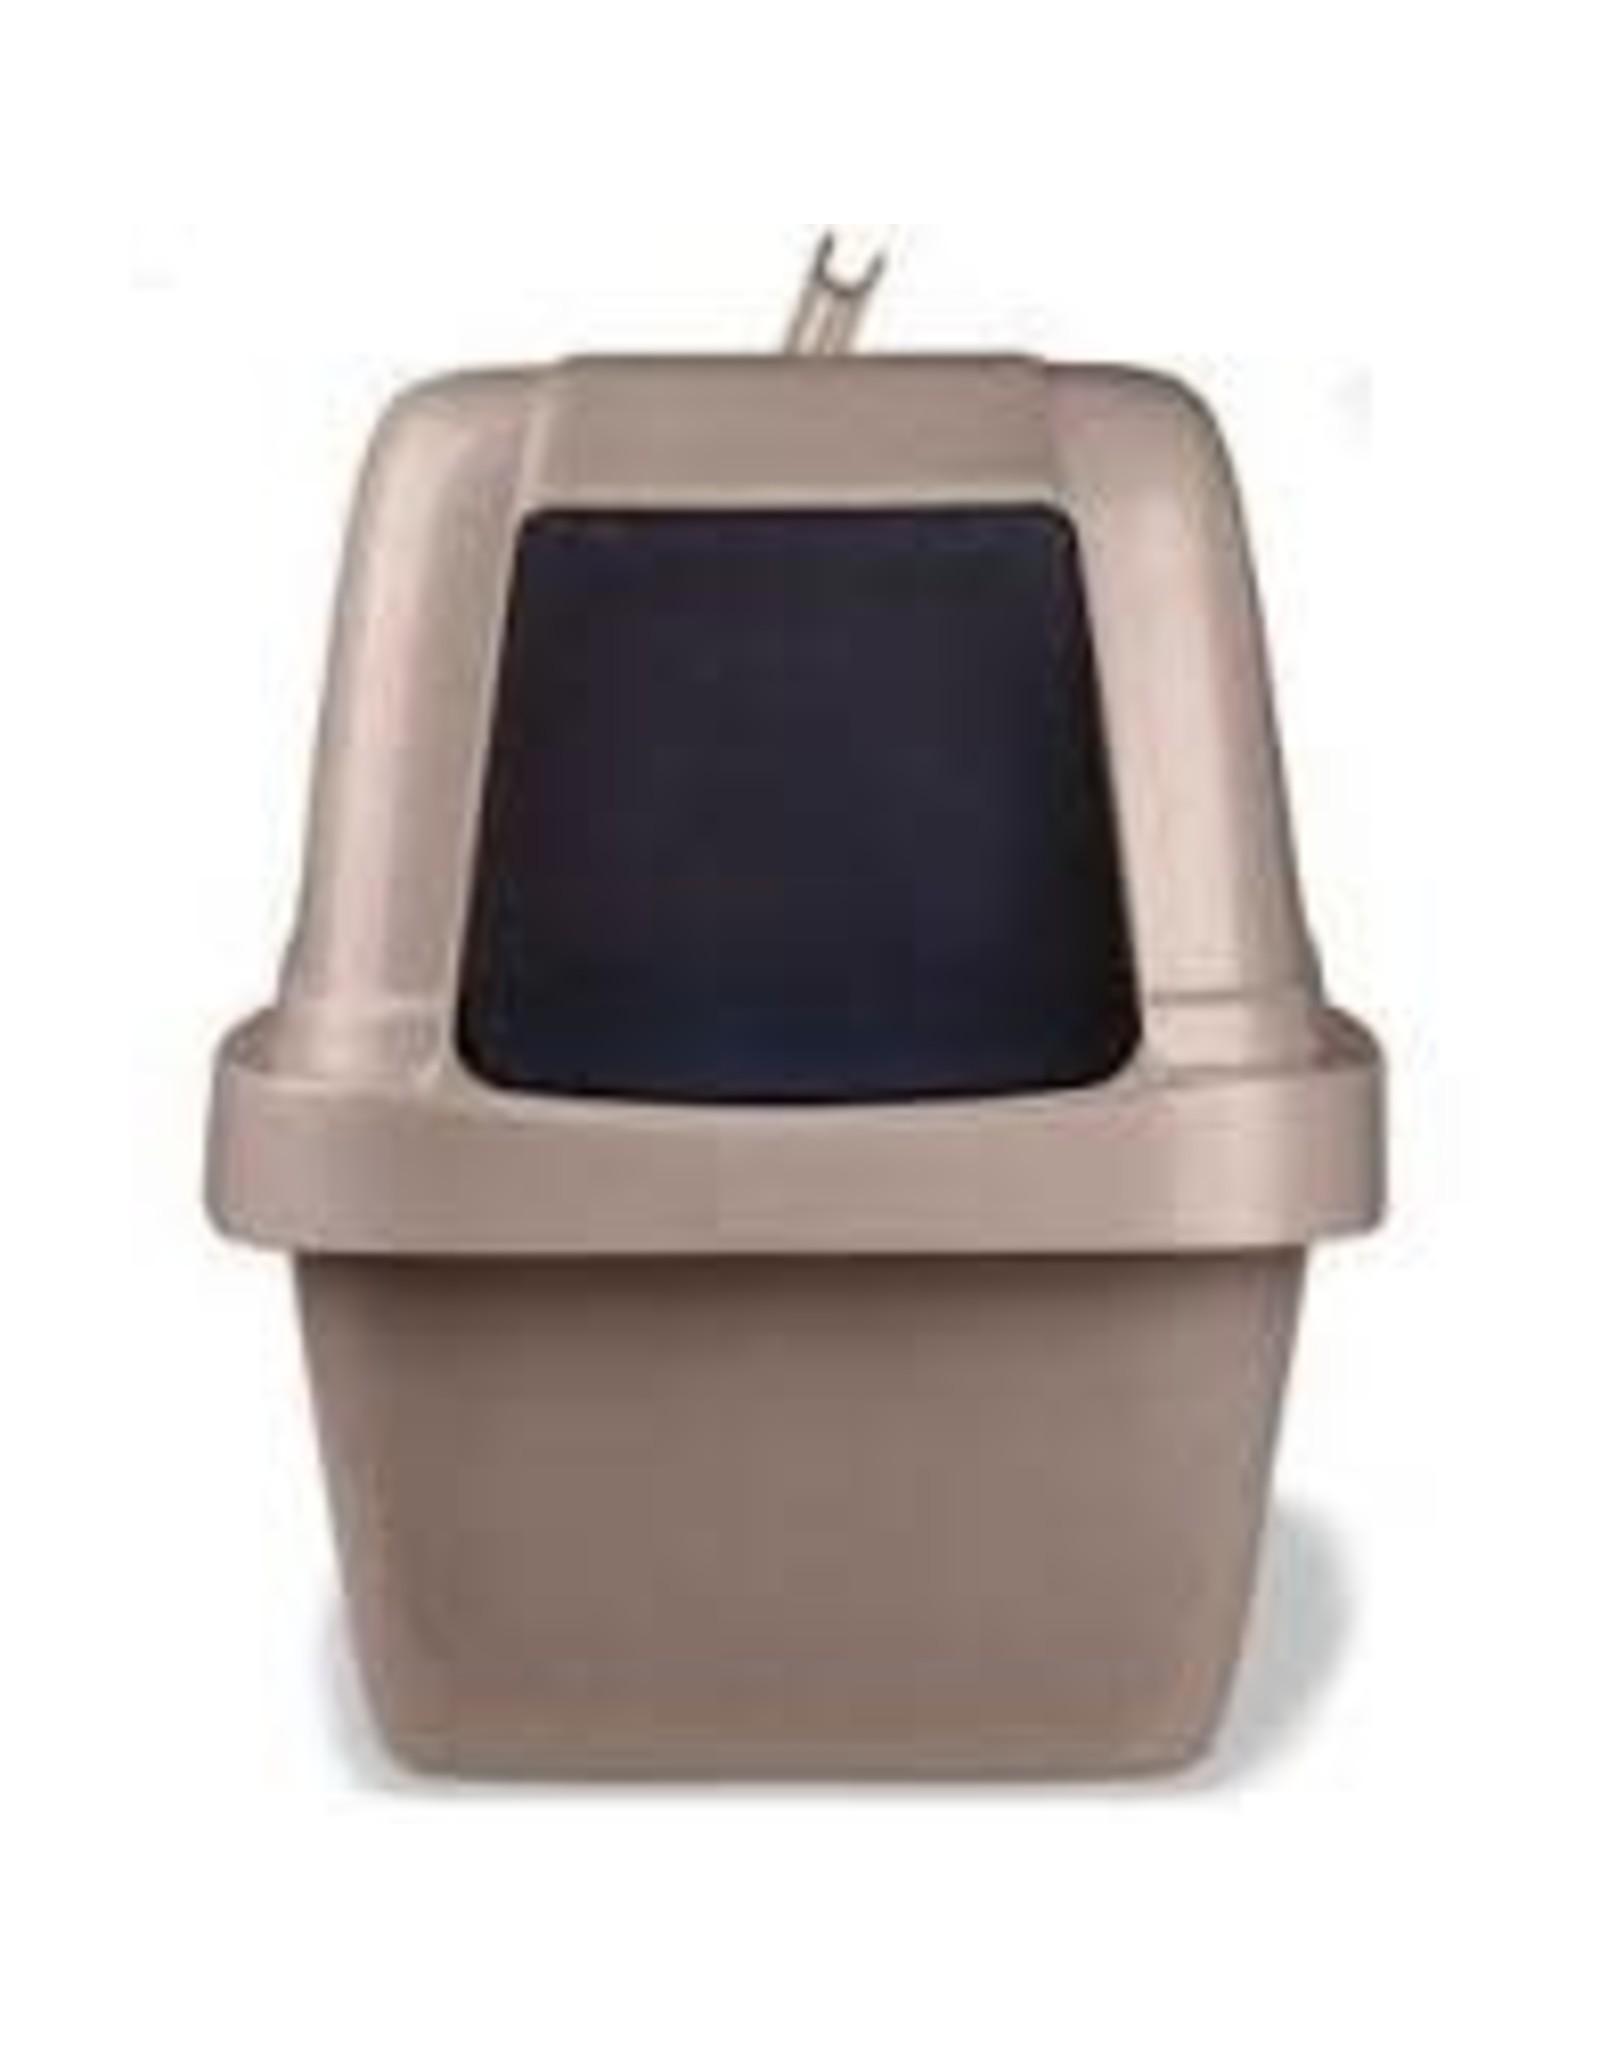 "Van Ness Van Ness - Enclosed Litter Pan Large 19""x15""x16"""